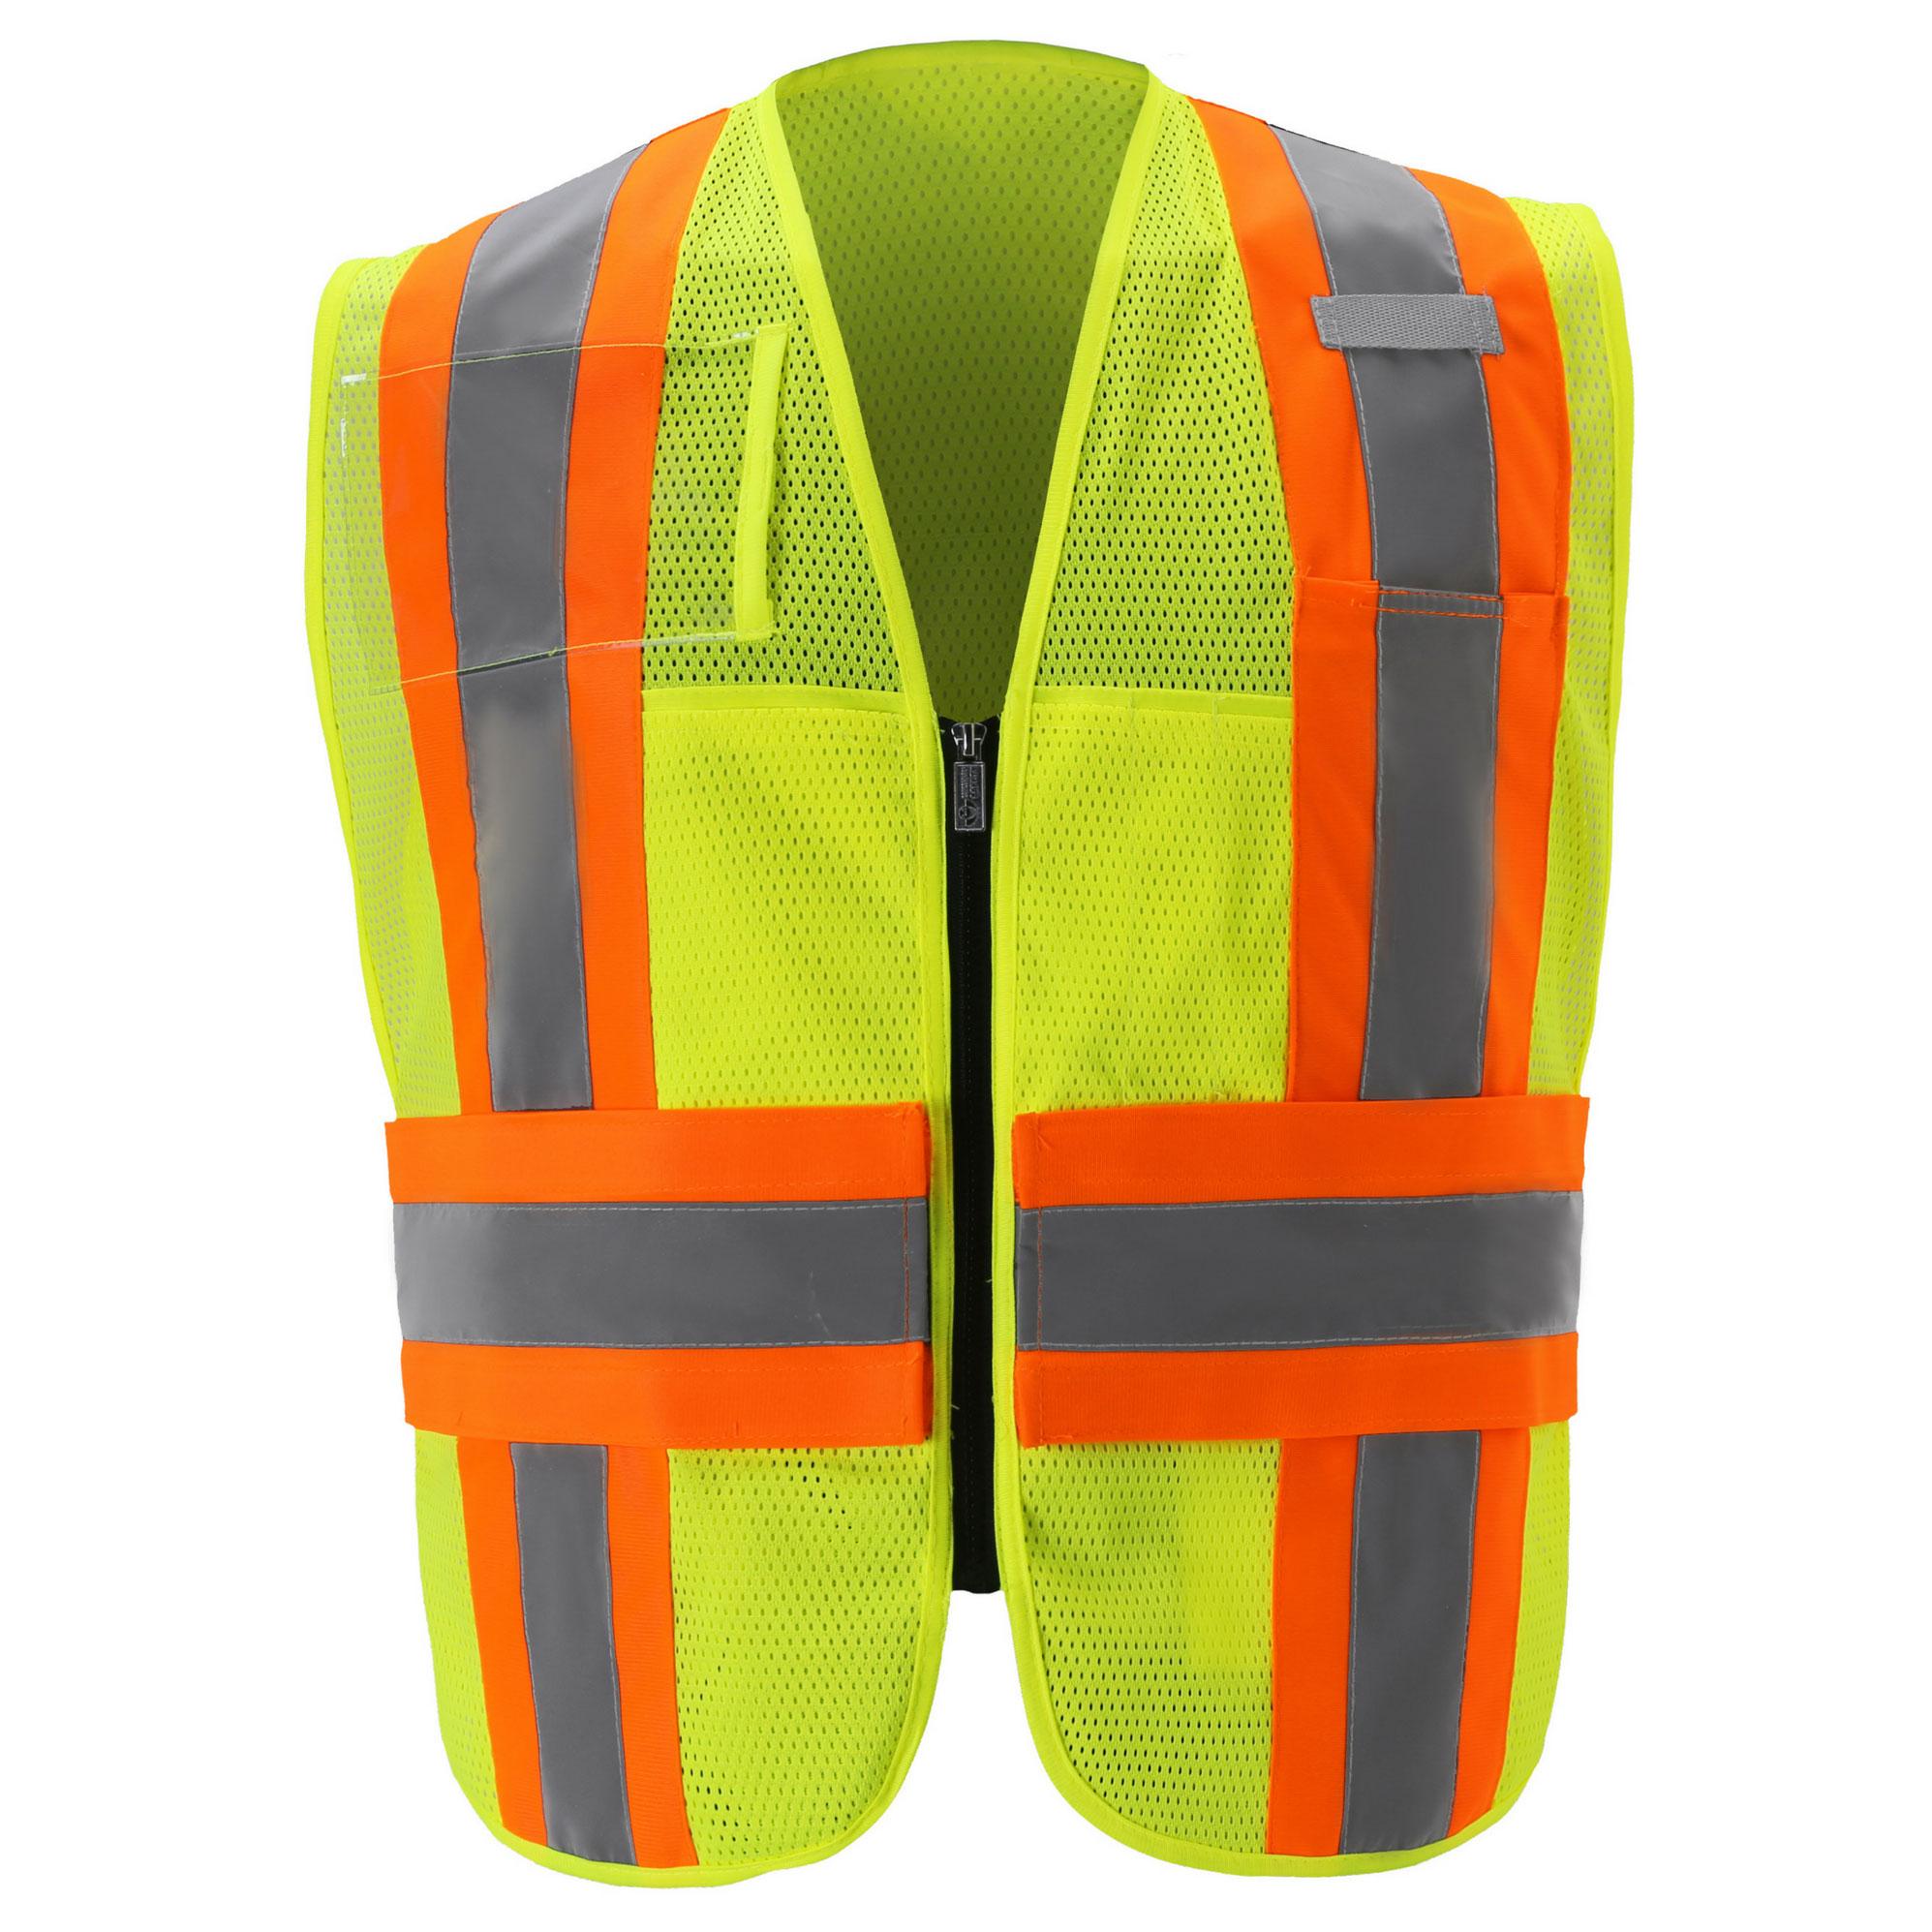 Mesh Contrast Incident Command Vest-